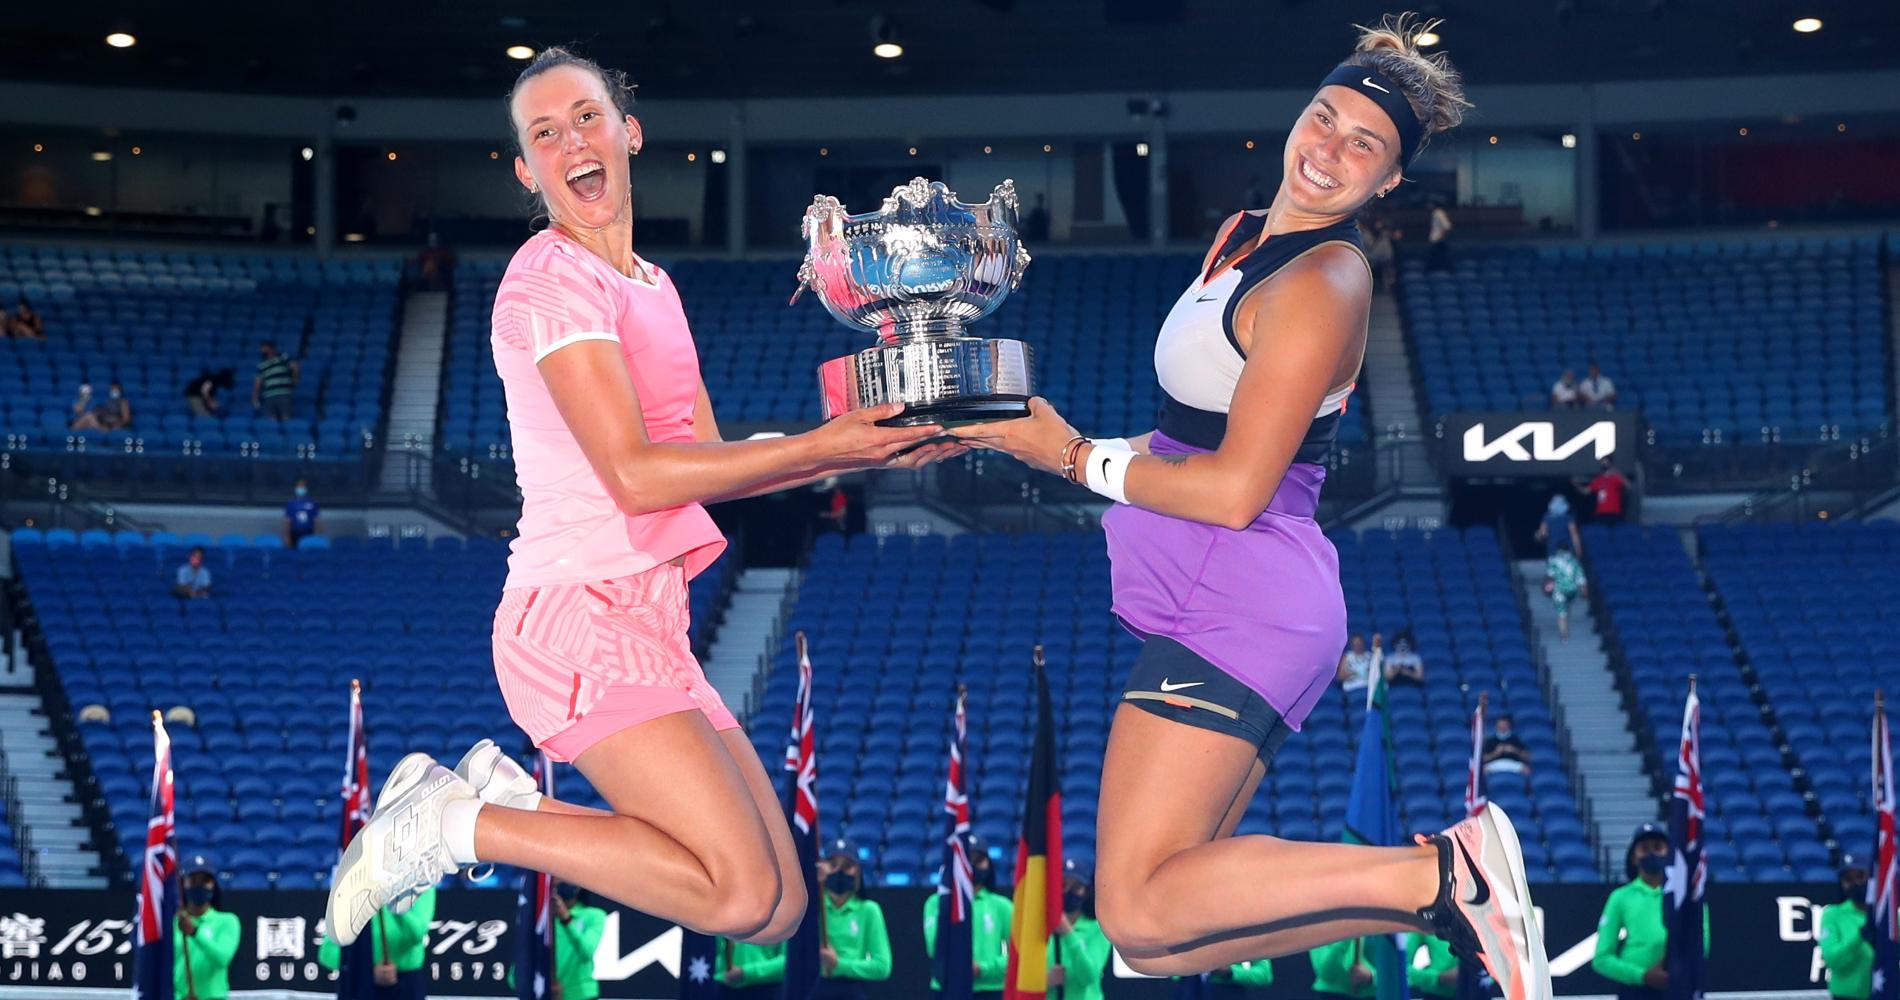 Elise Mertens & Aryna Sabalenka, Women's Doubles champions, 2021 Australian Open